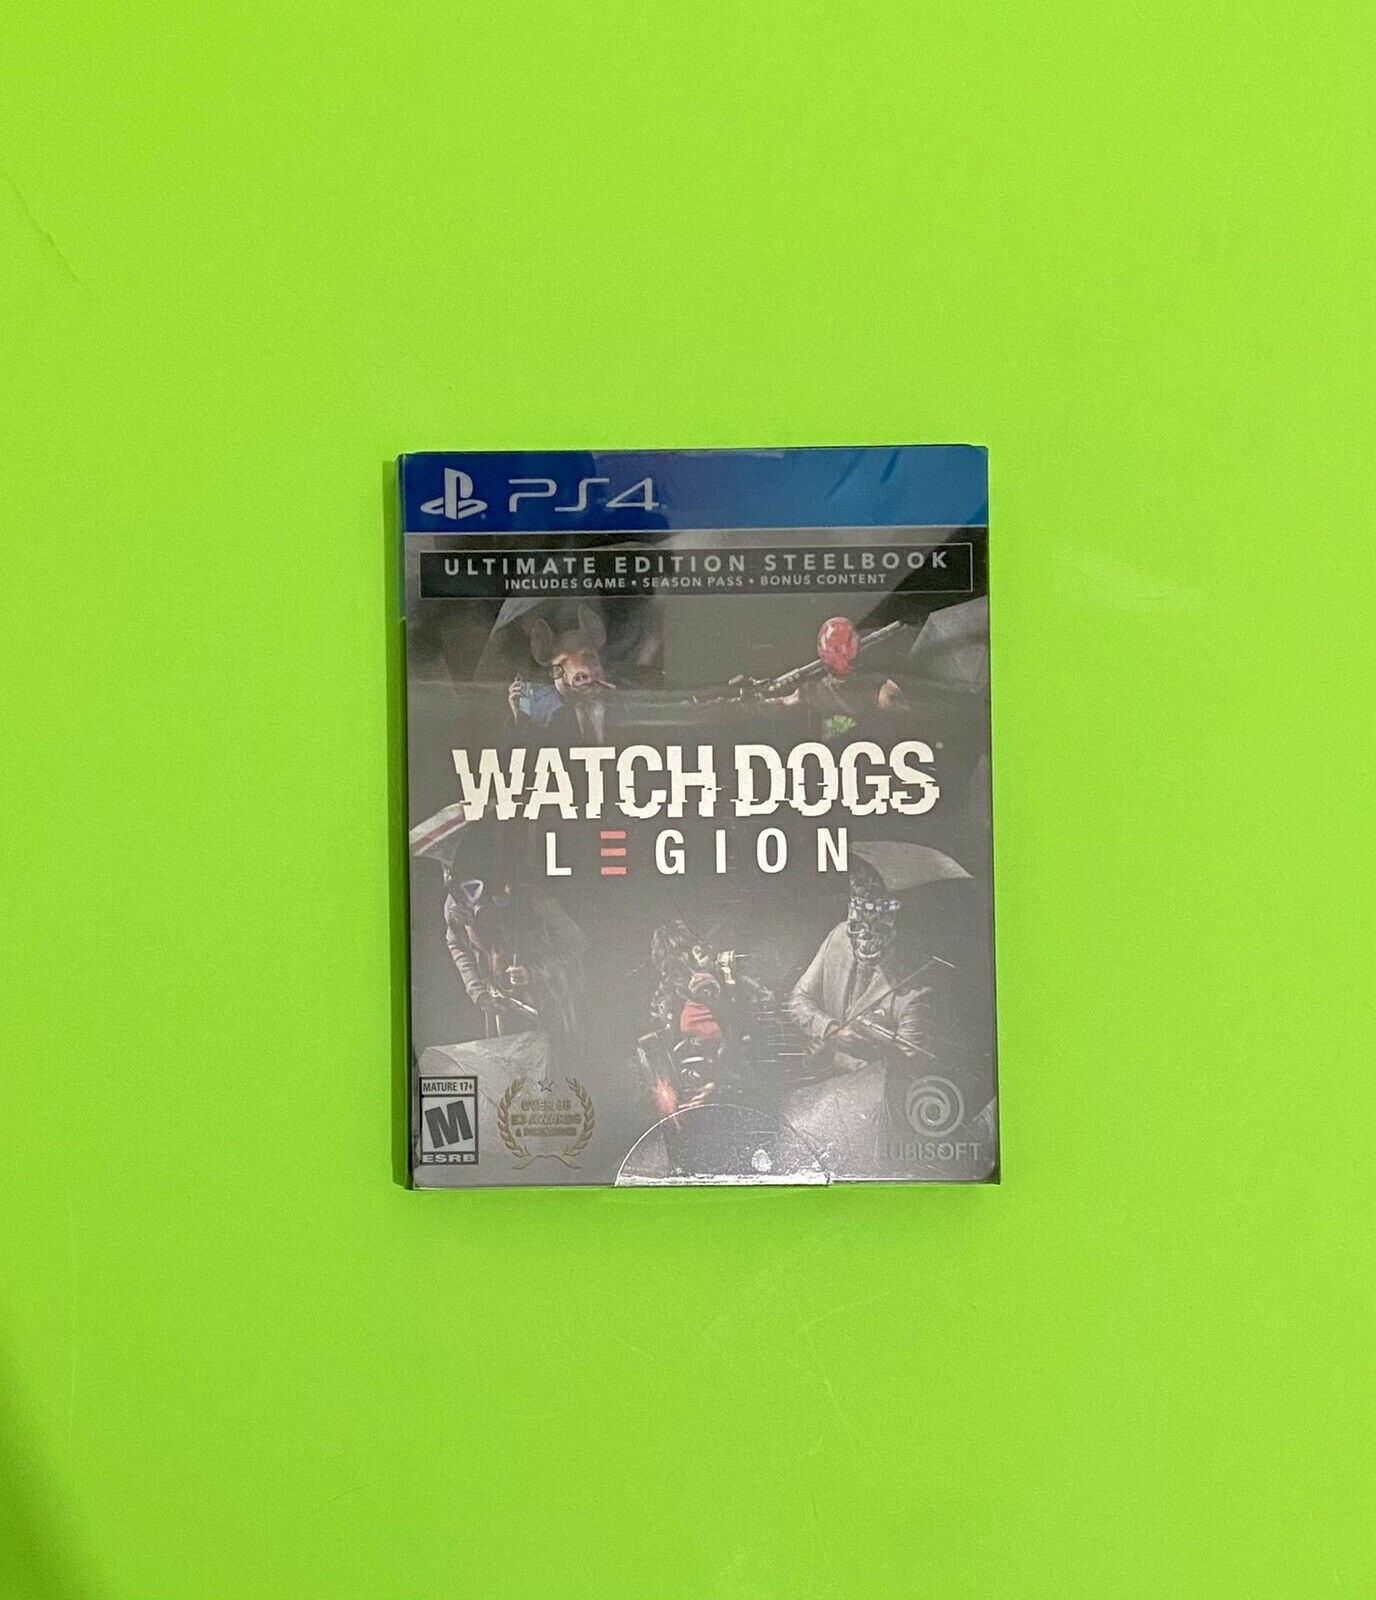 Watch Dogs: Legion Ultimate Steelbook Edition Ubisoft ใหม่เอี่ยม * จัดส่งฟรี * - C'mon » TikTokJa Video Downloader